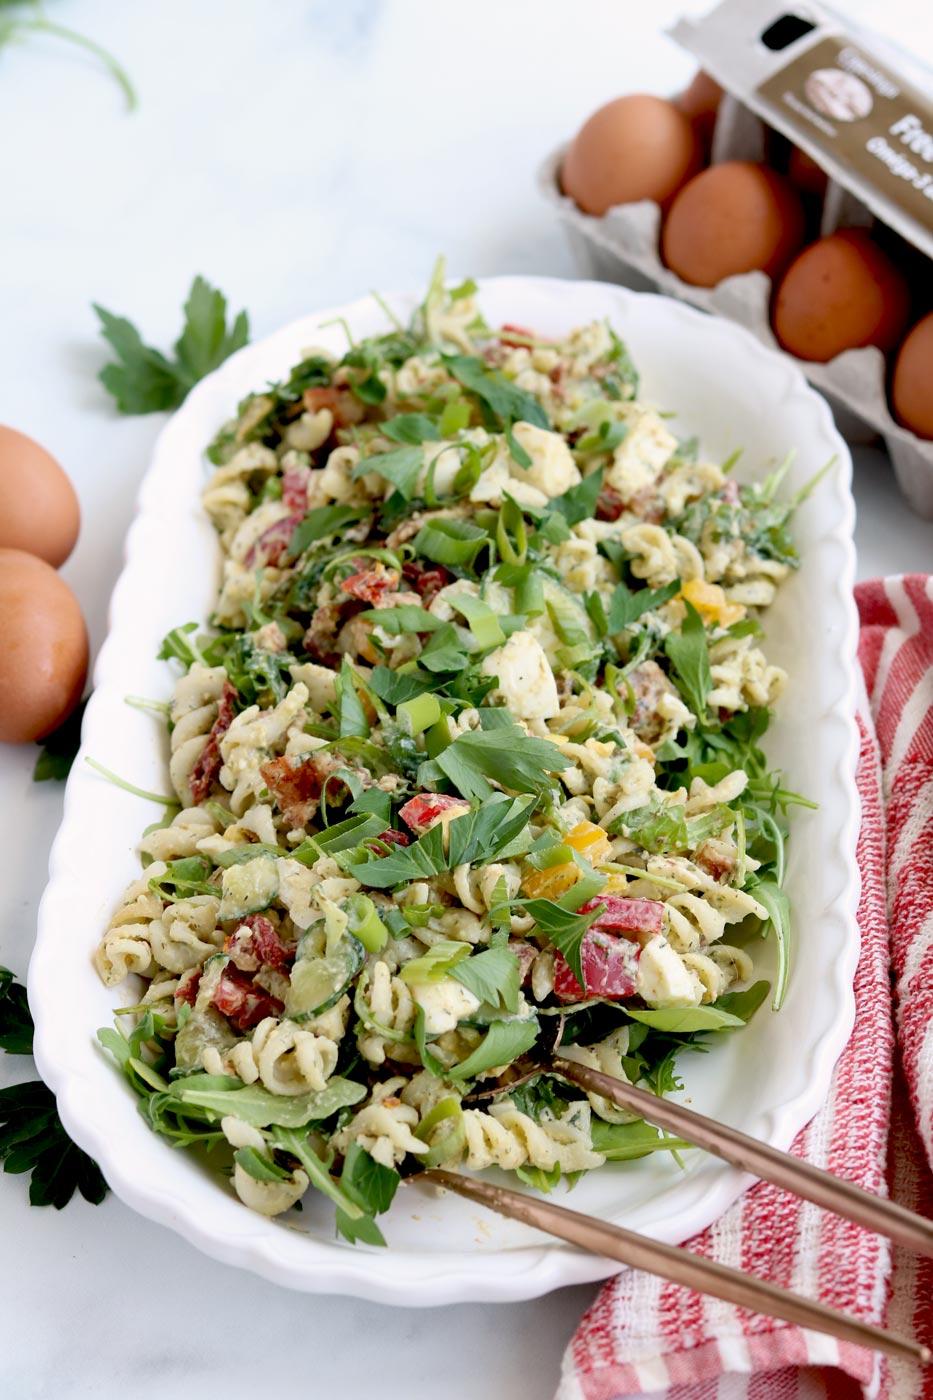 Gluten Free B E L T Pasta Salad With Avocado Ranch Dressing